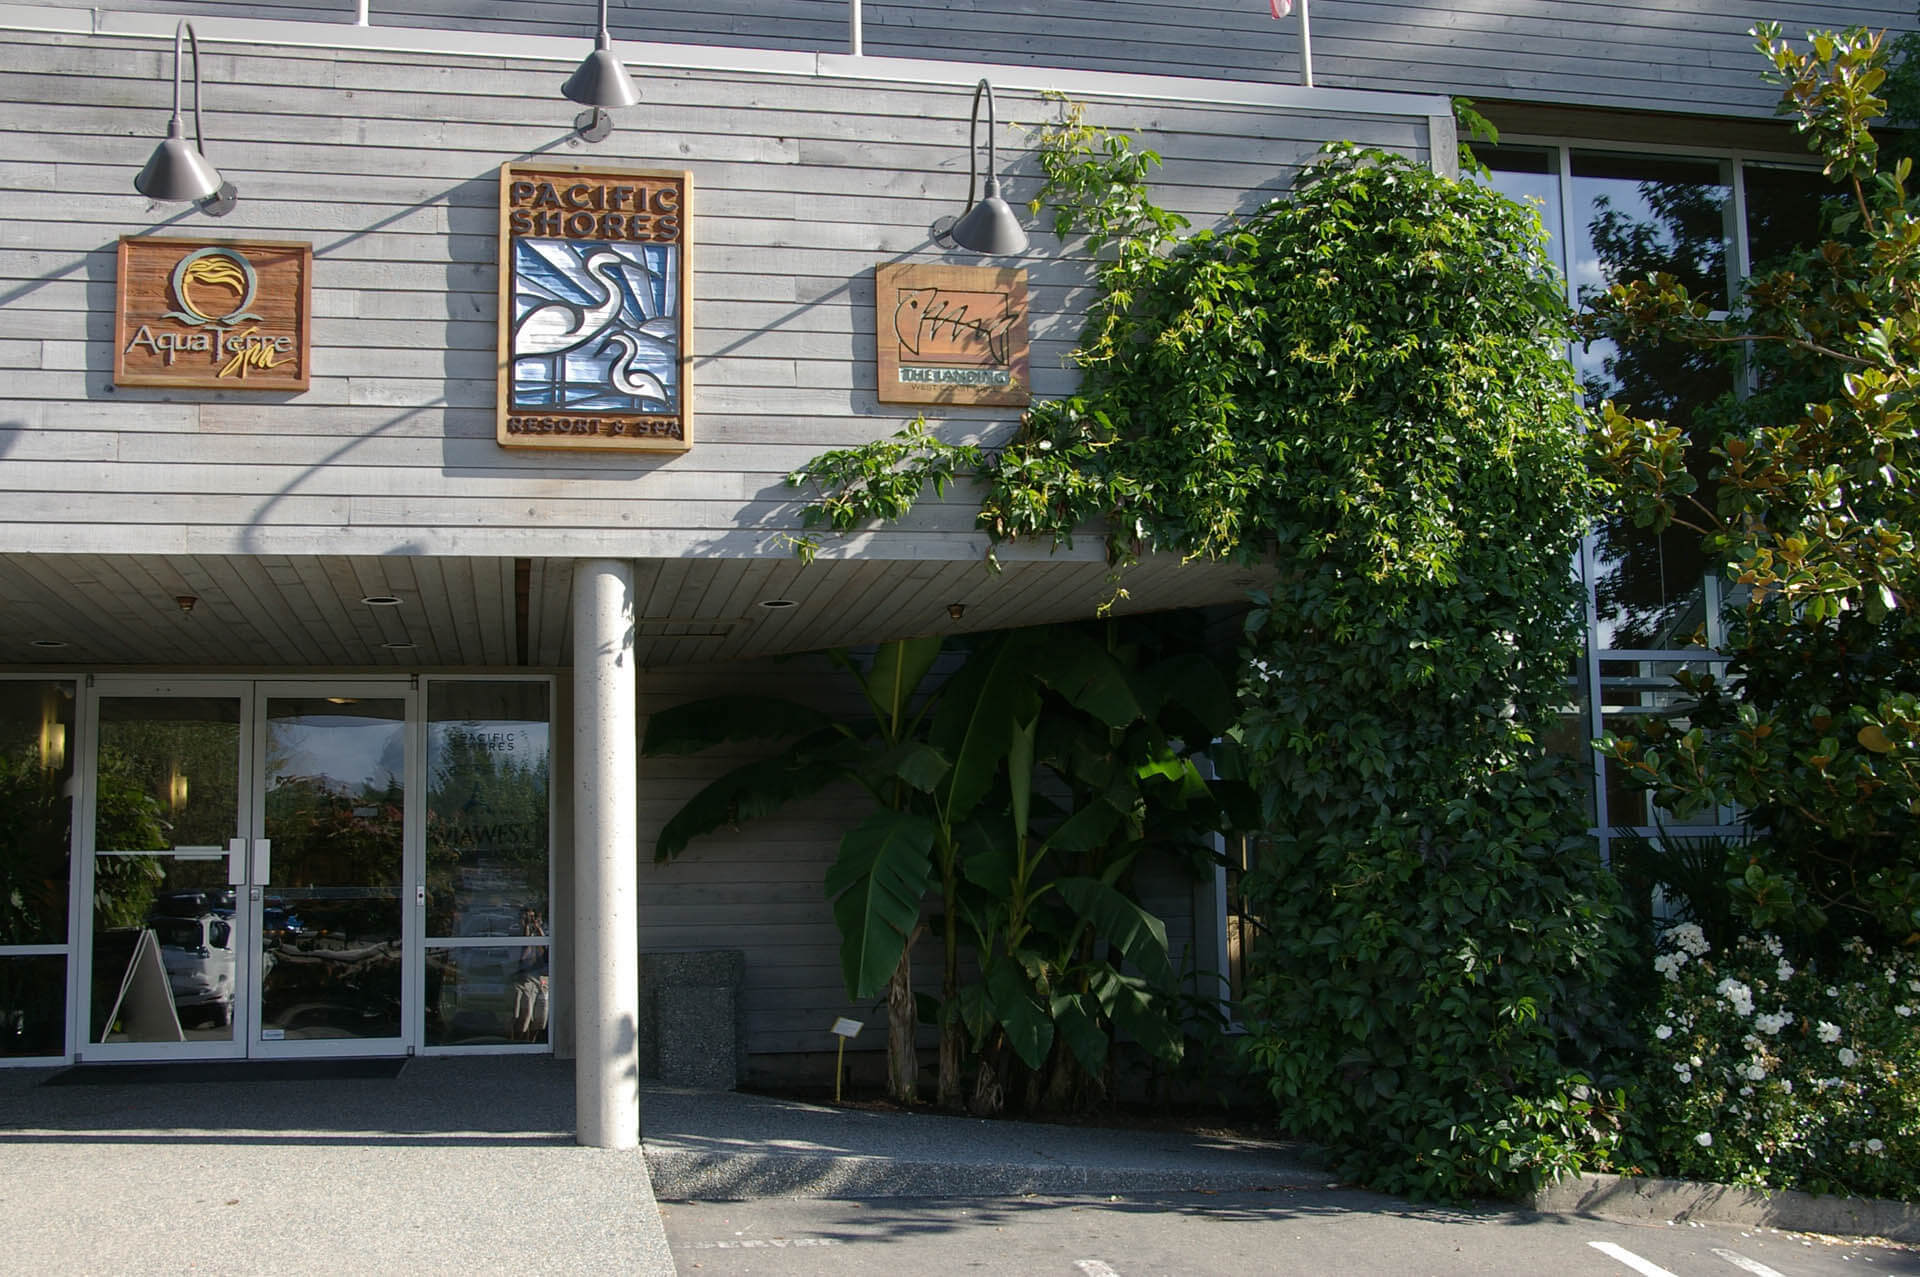 Pacific Shores Resort Spa Signage